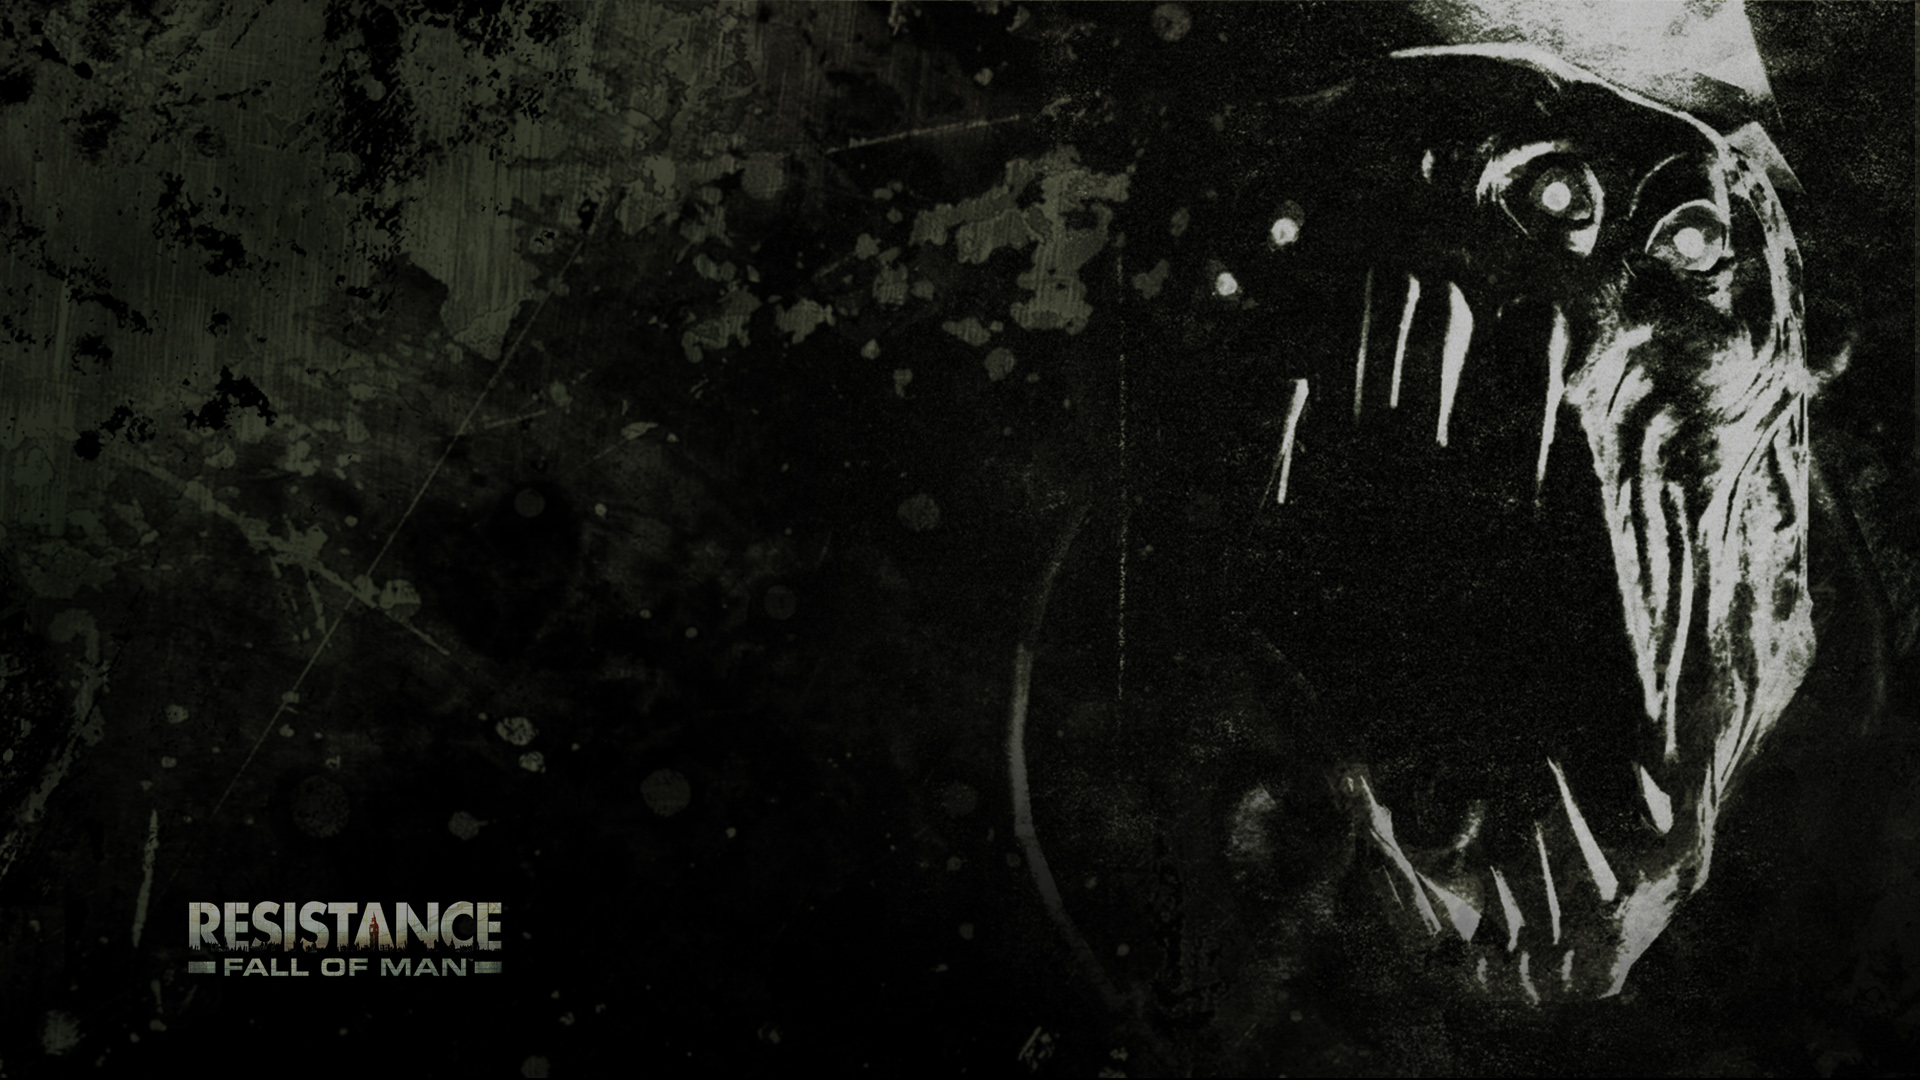 Resistance Wallpaper 34908 1680x1050 px